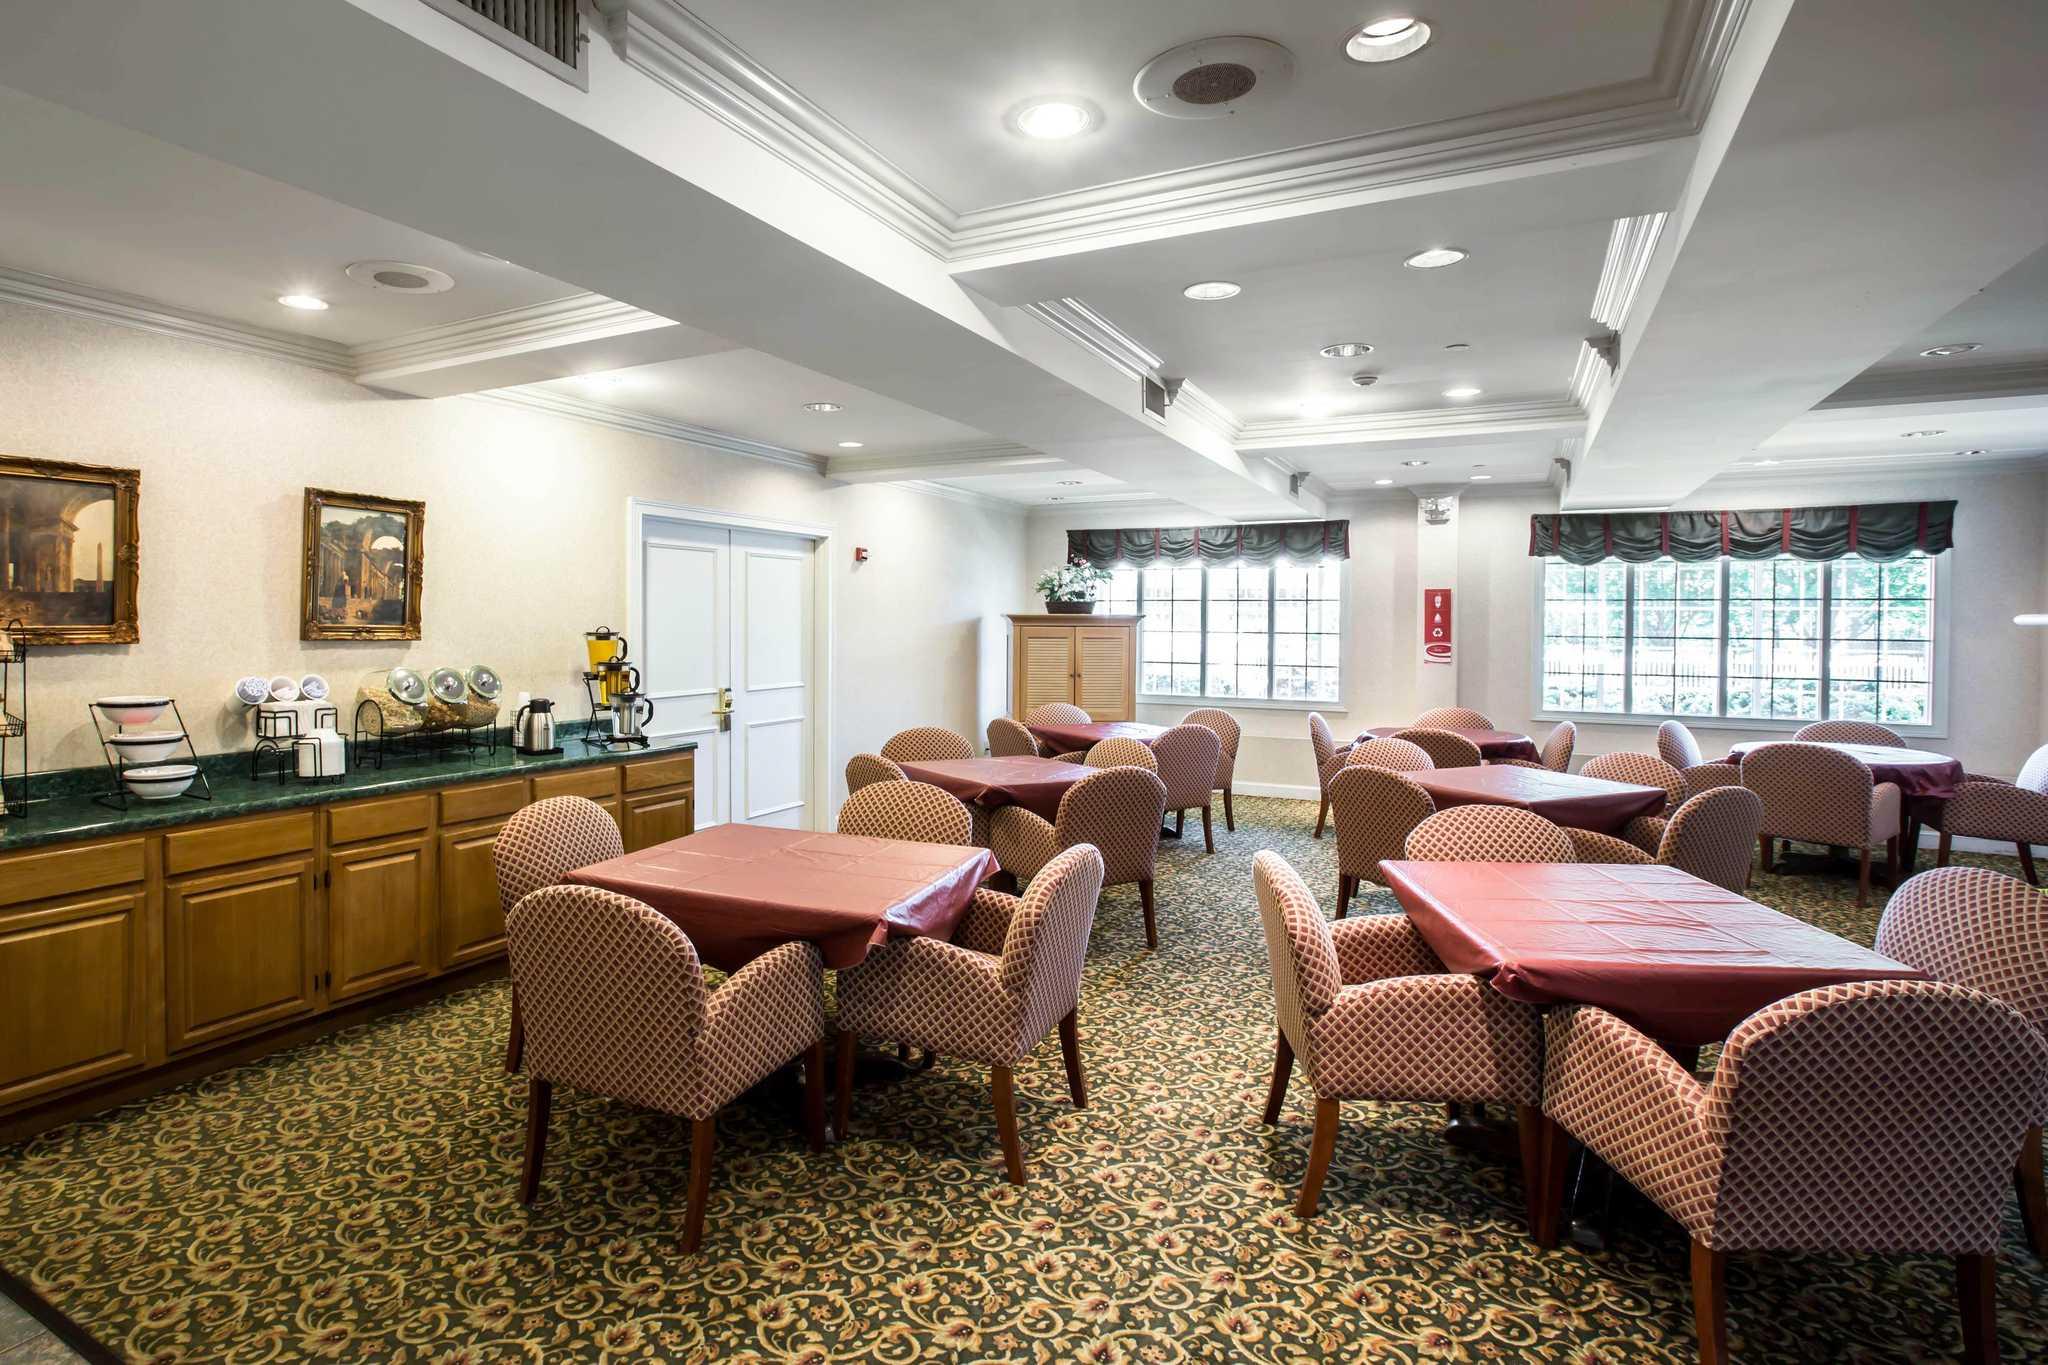 Econo Lodge image 22